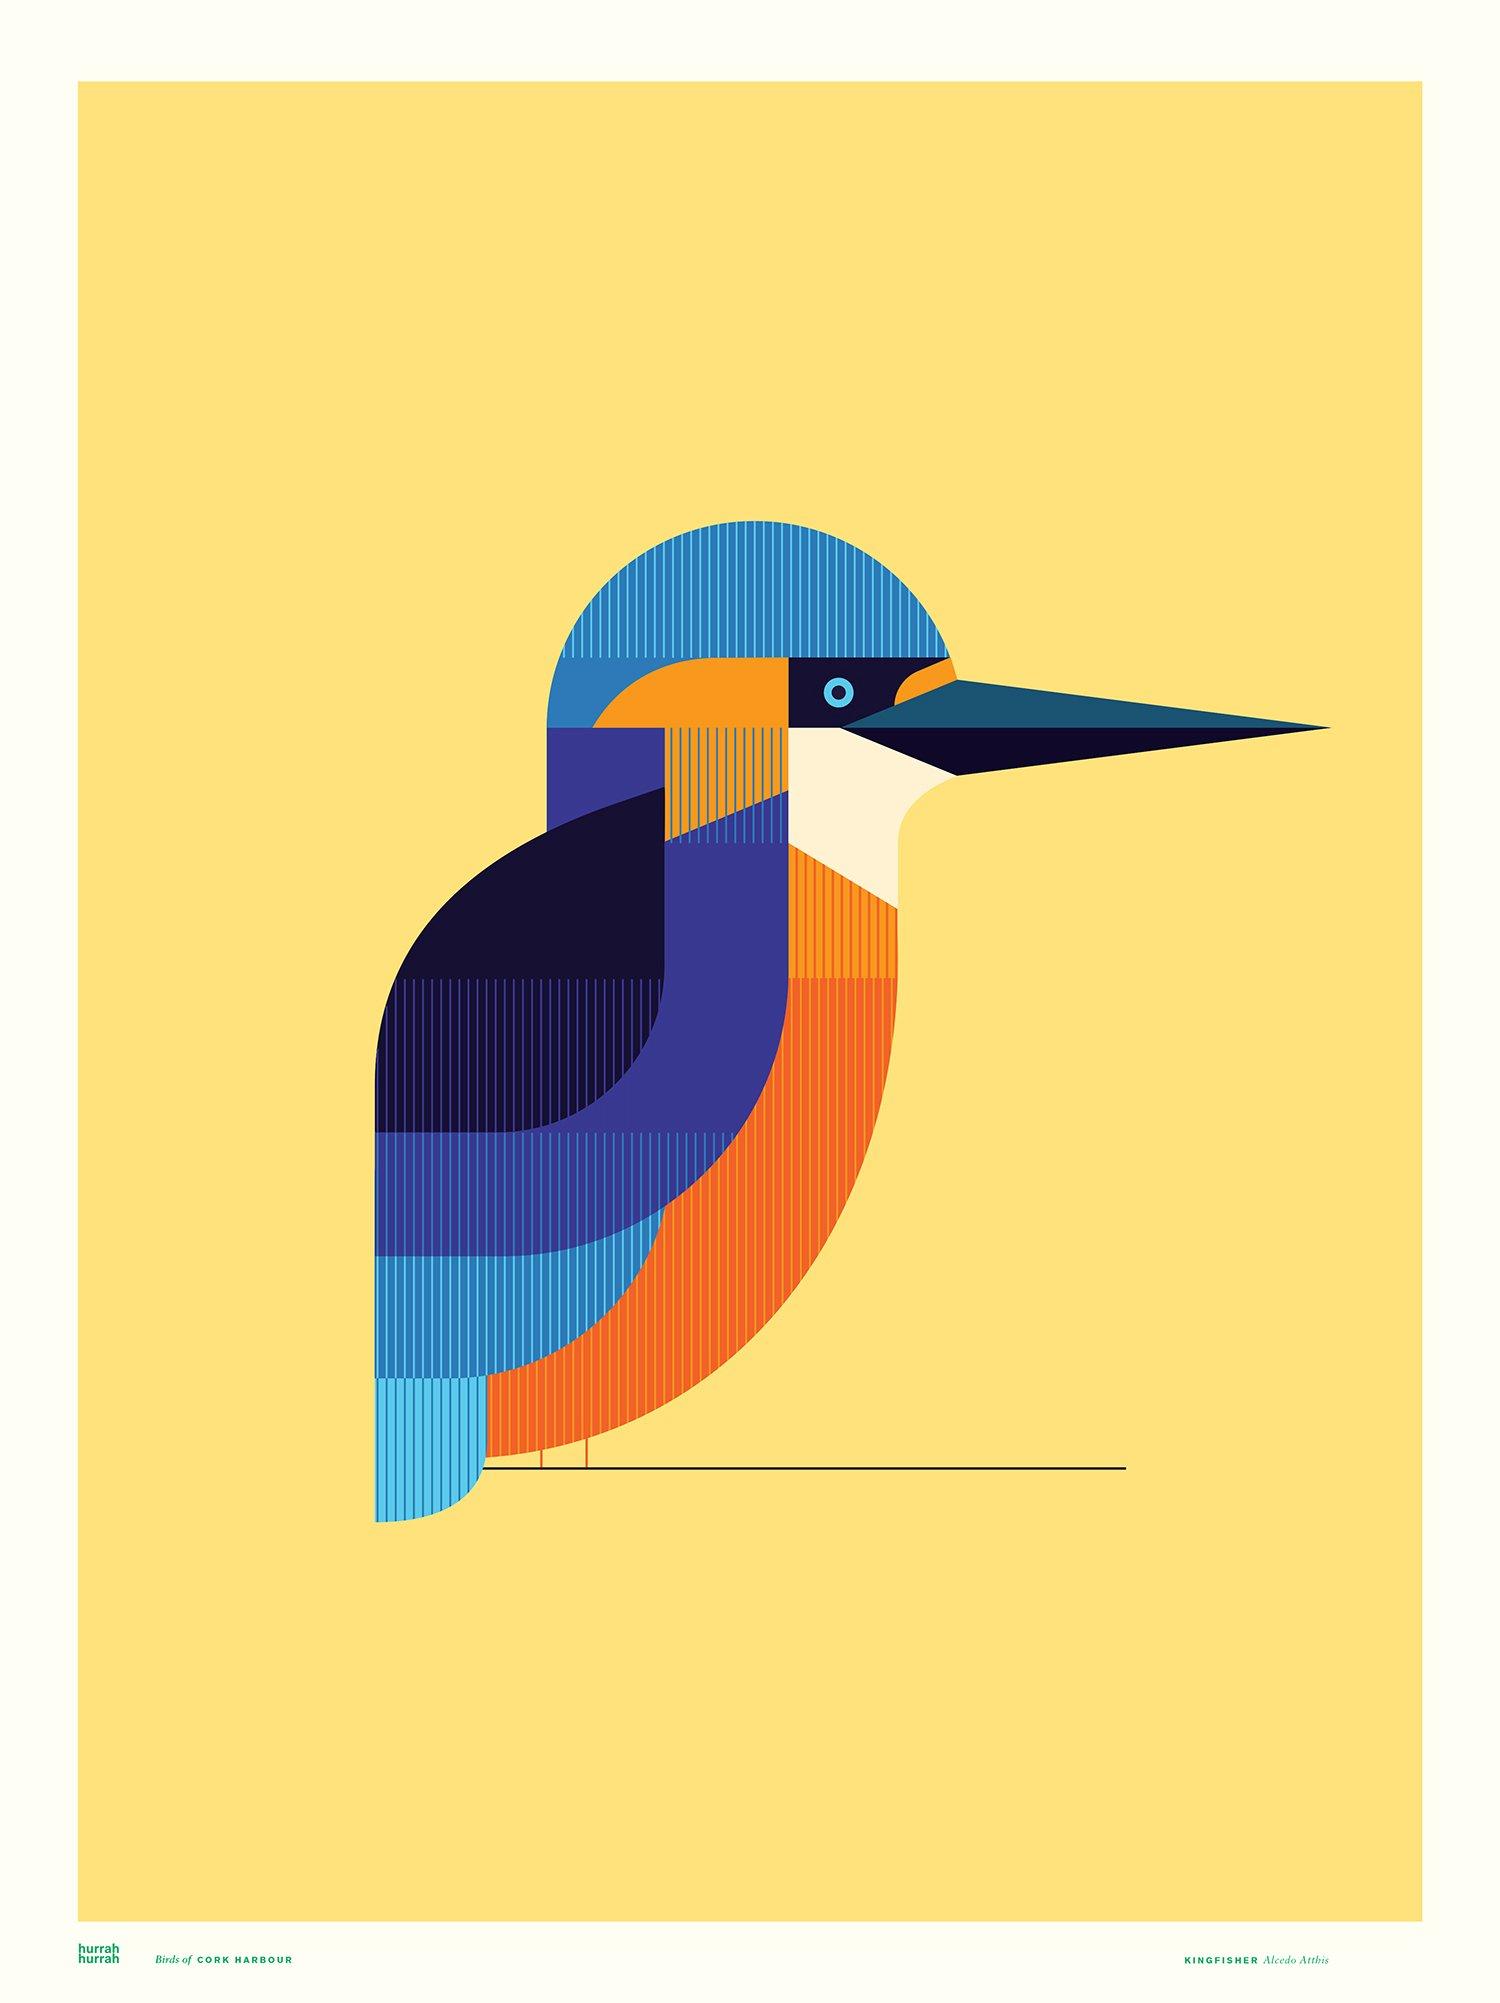 Kingfisher / Cork Harbour Birds